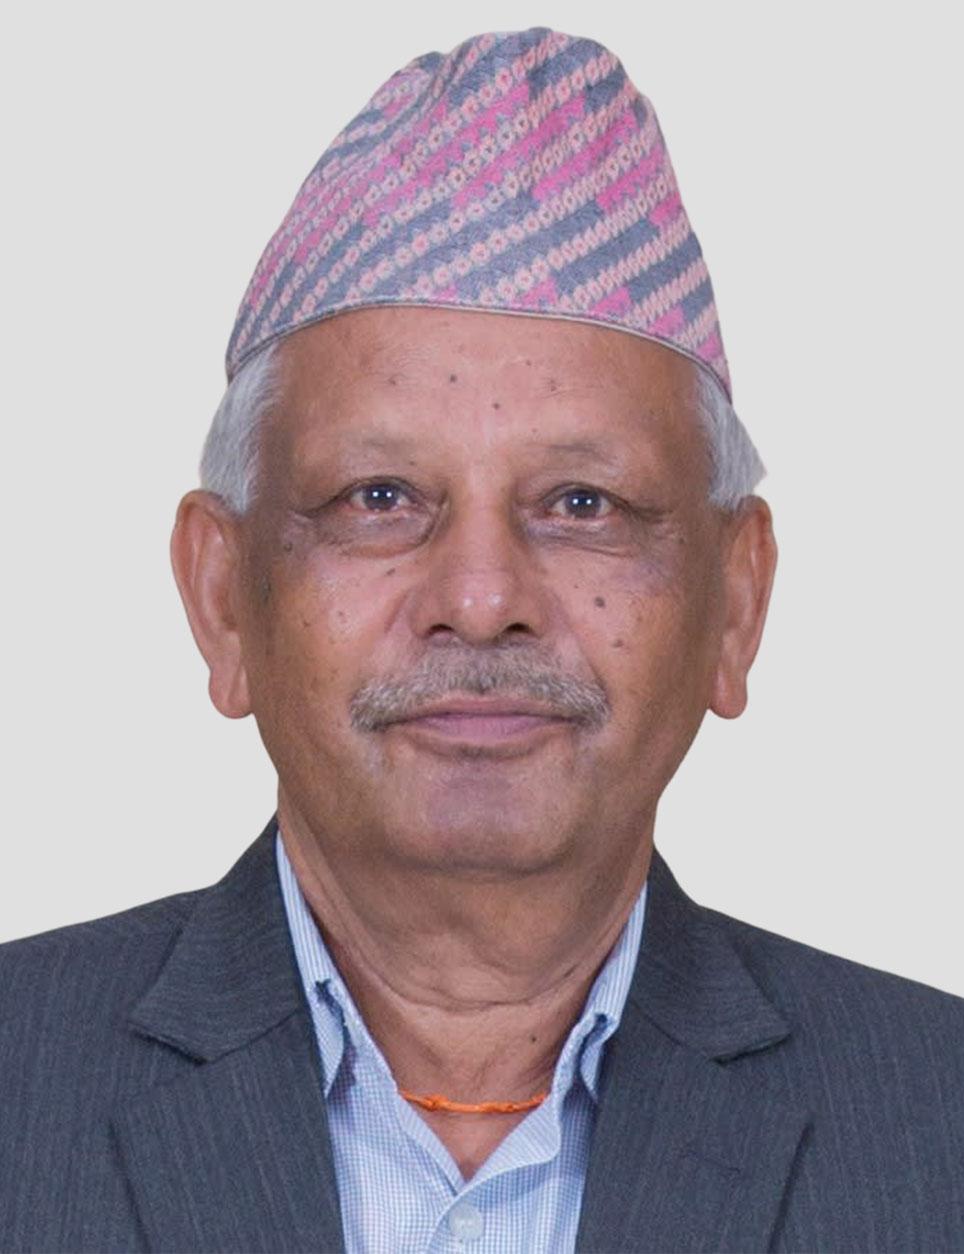 Mr. Ramesh Singh Khadka